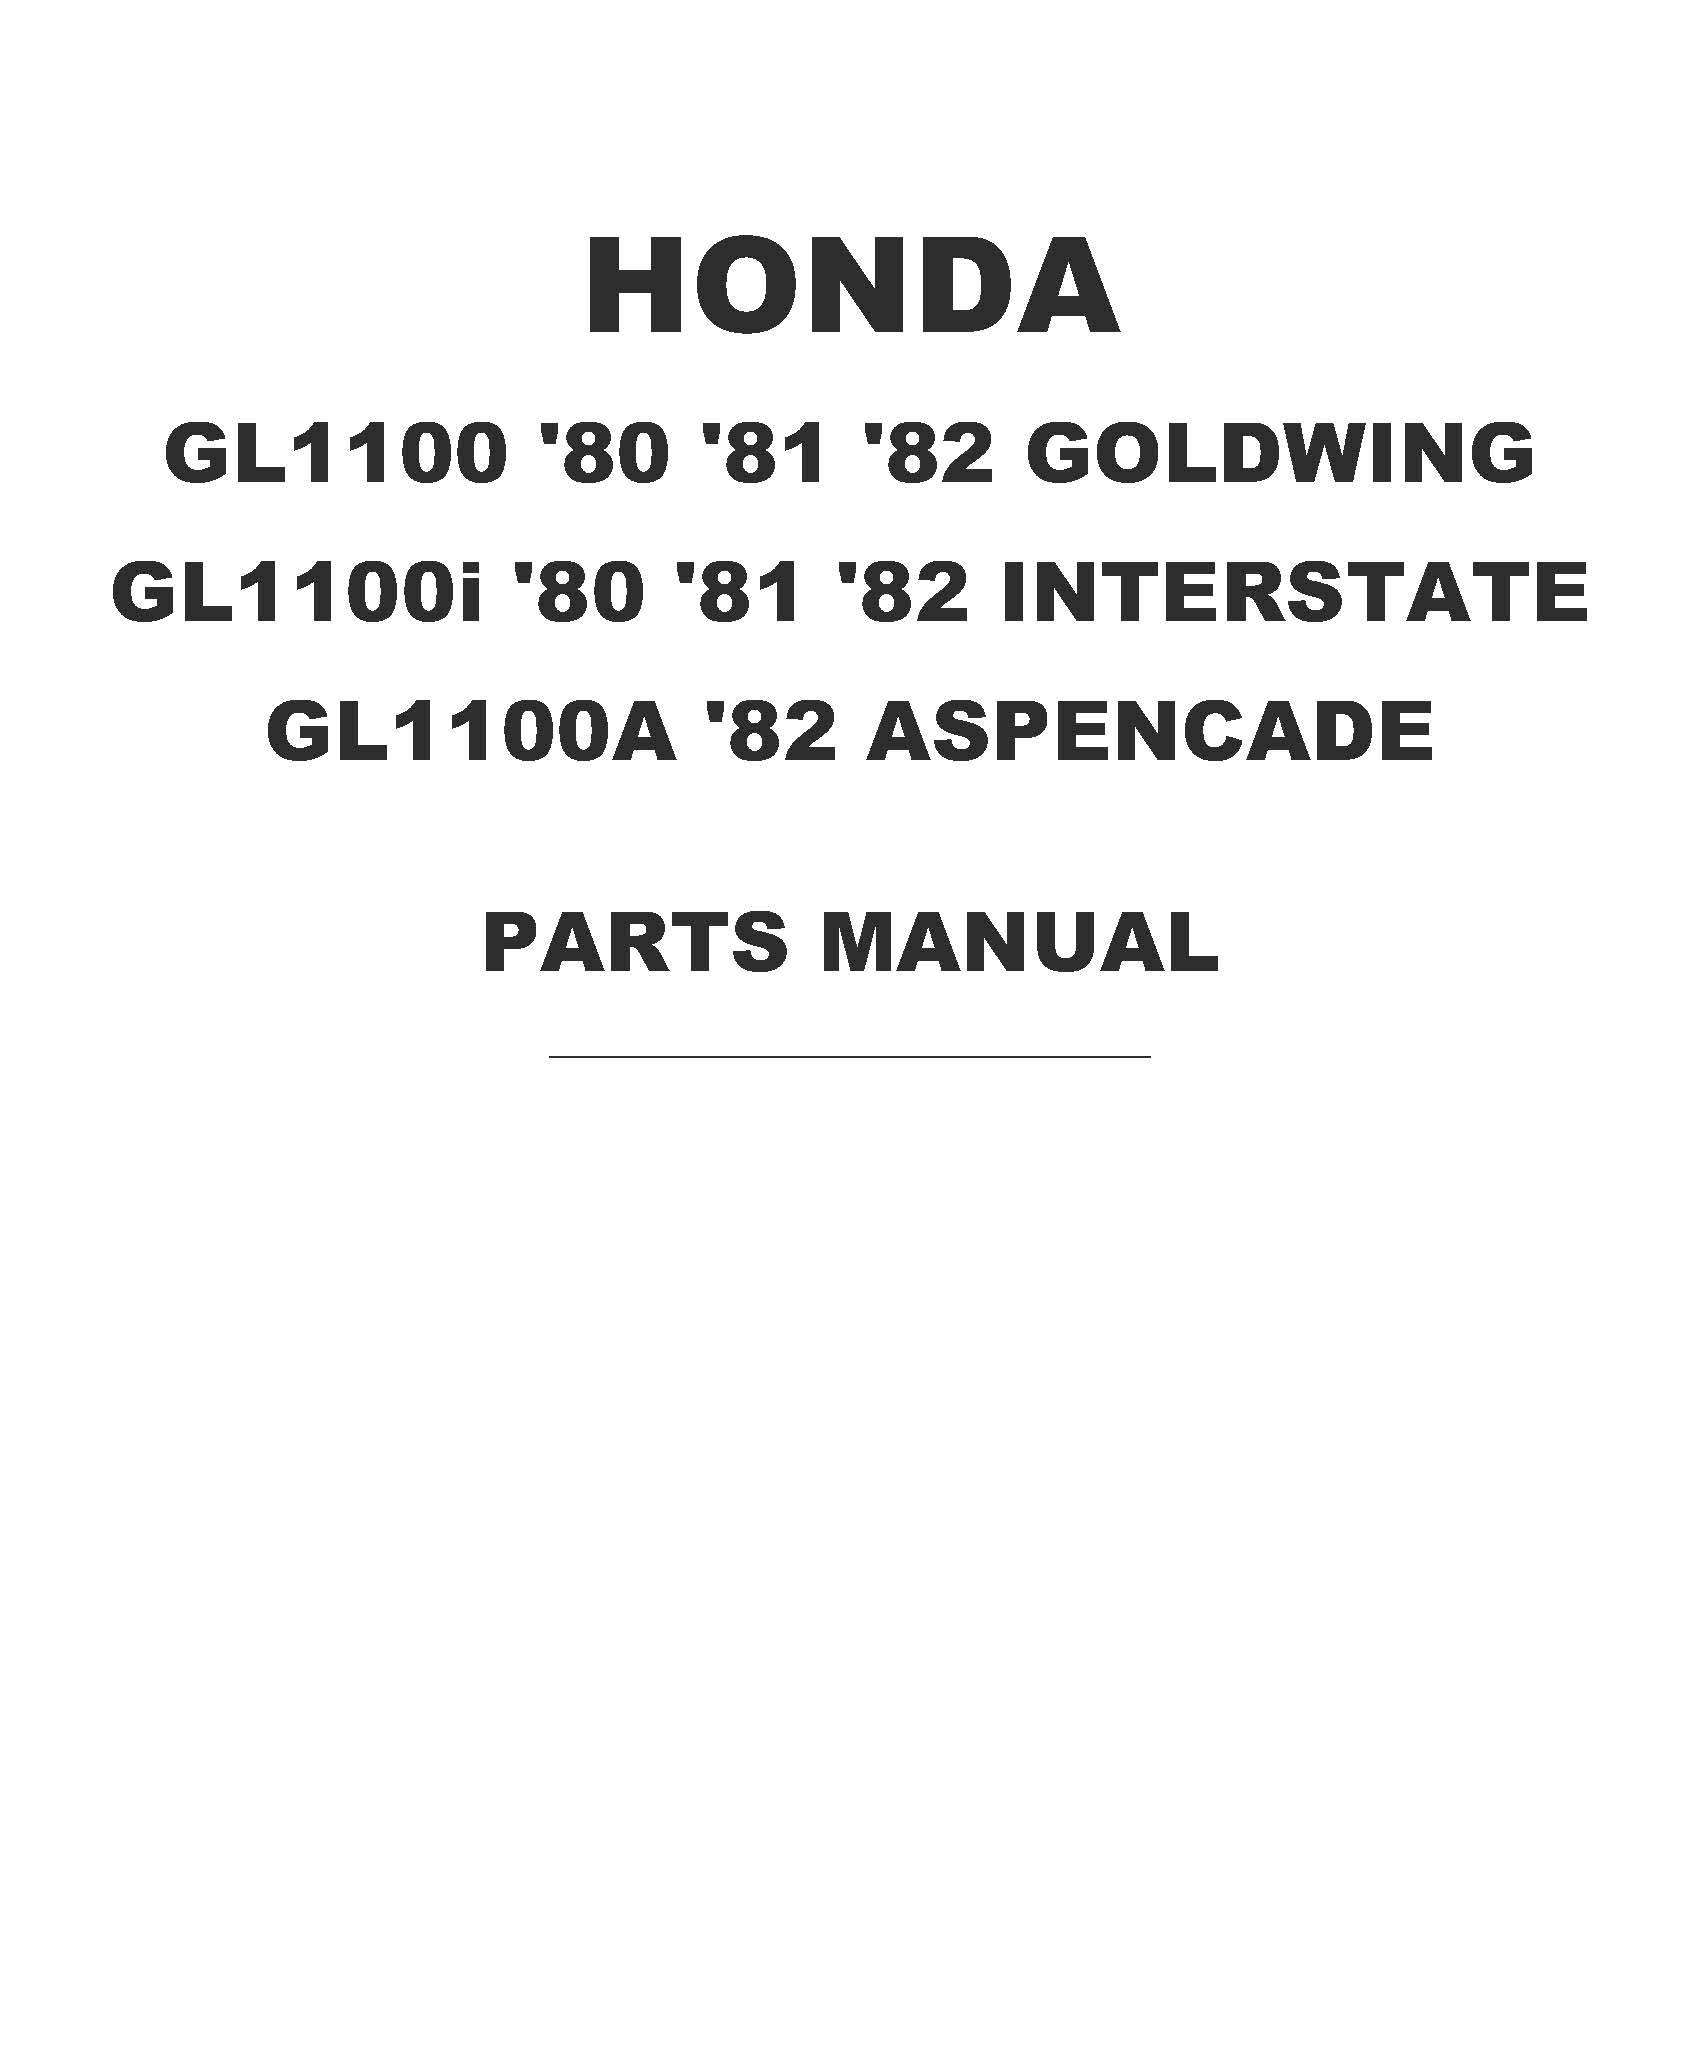 Parts list for Honda GL1100A Aspencade (1982)